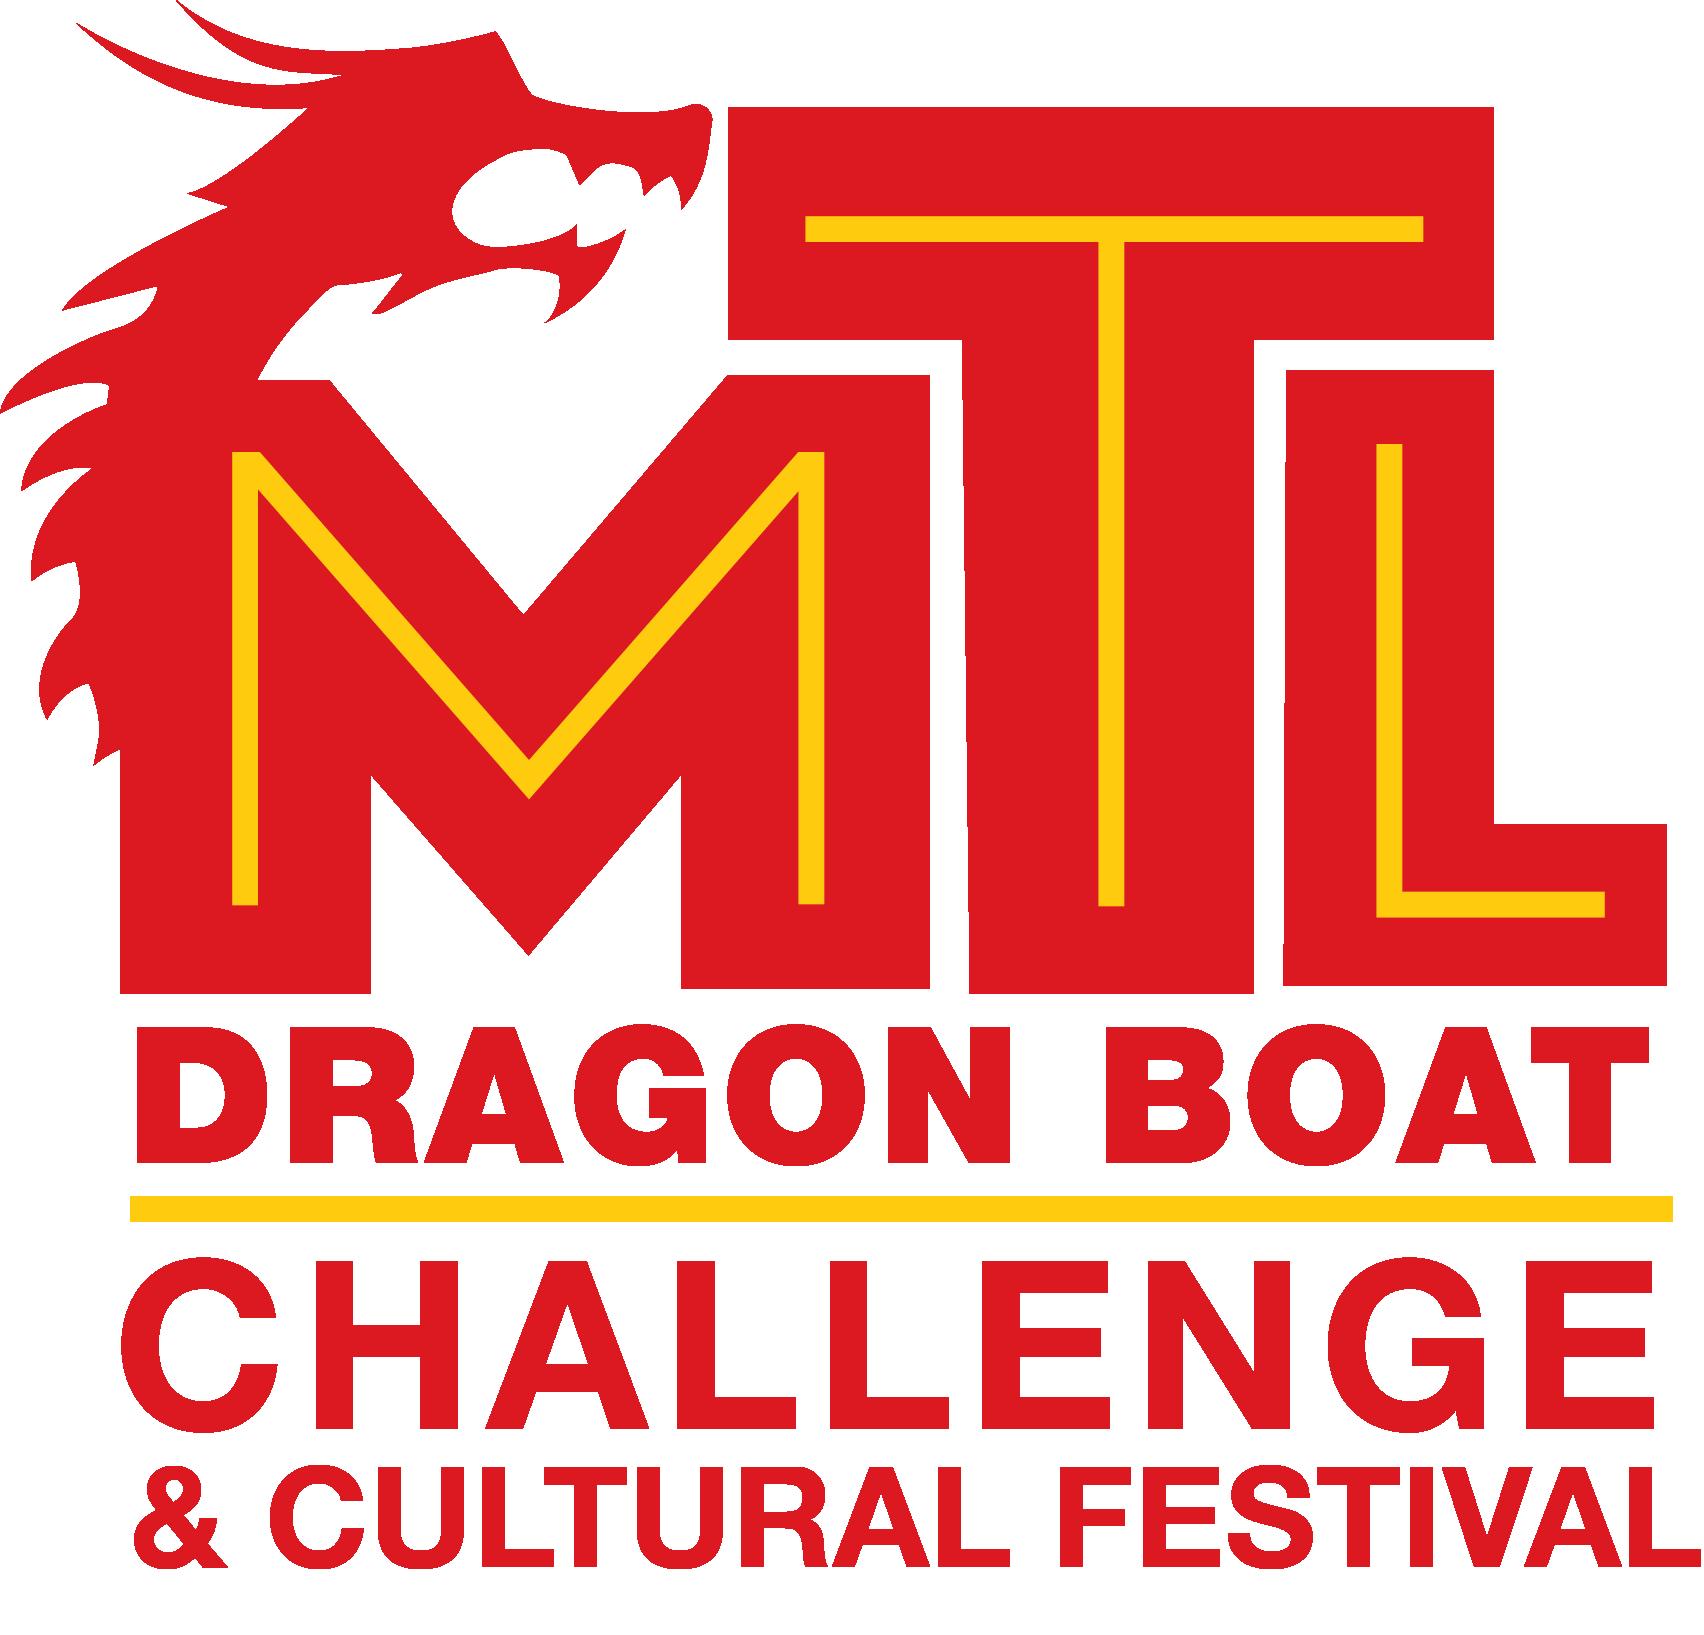 MTL Dragon boat challenge & cultural festival